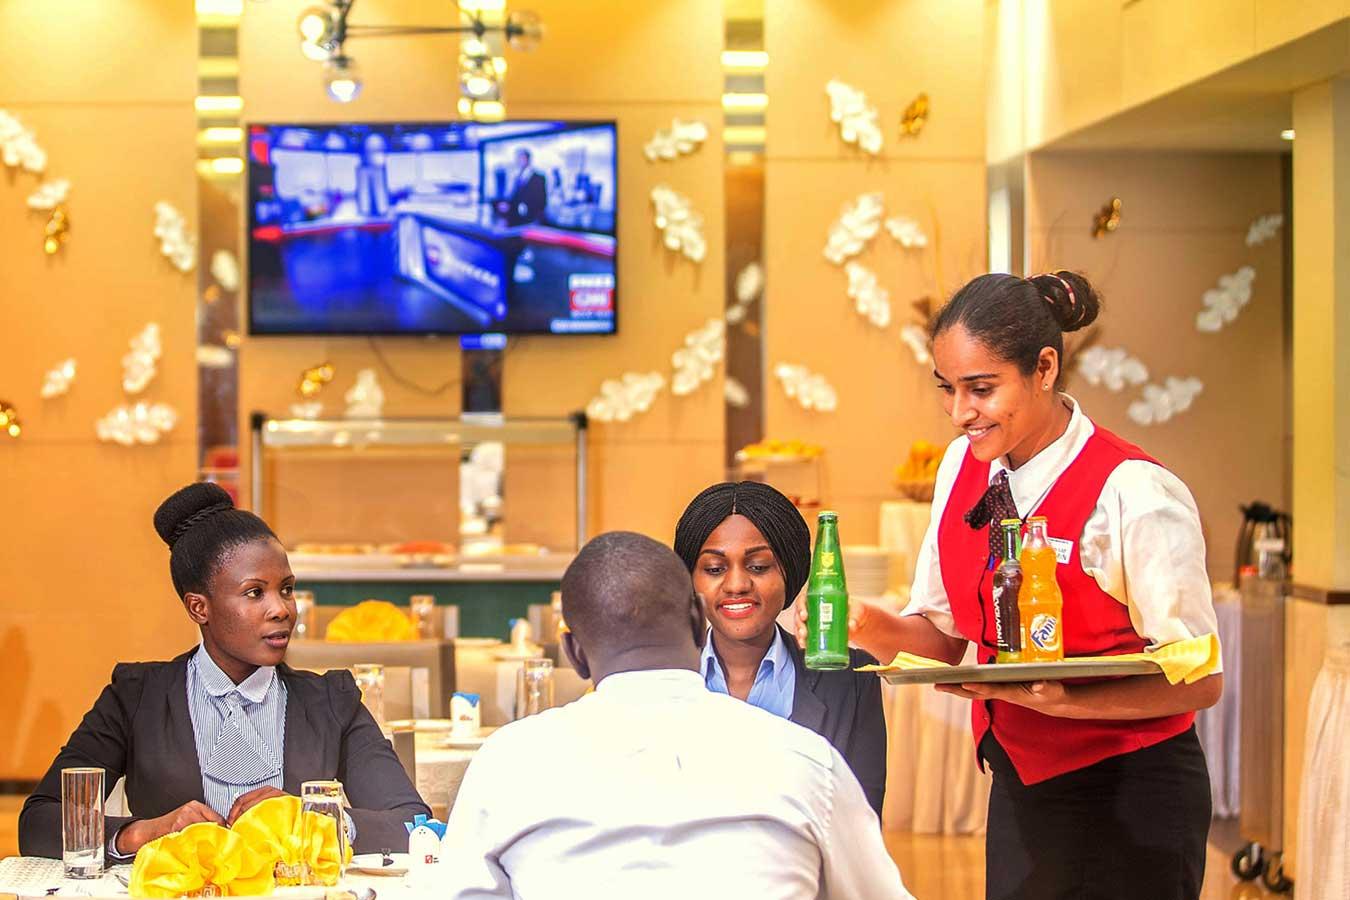 kara-tunga-karamoja-tourism-academy-school-hotel-africana-moroto